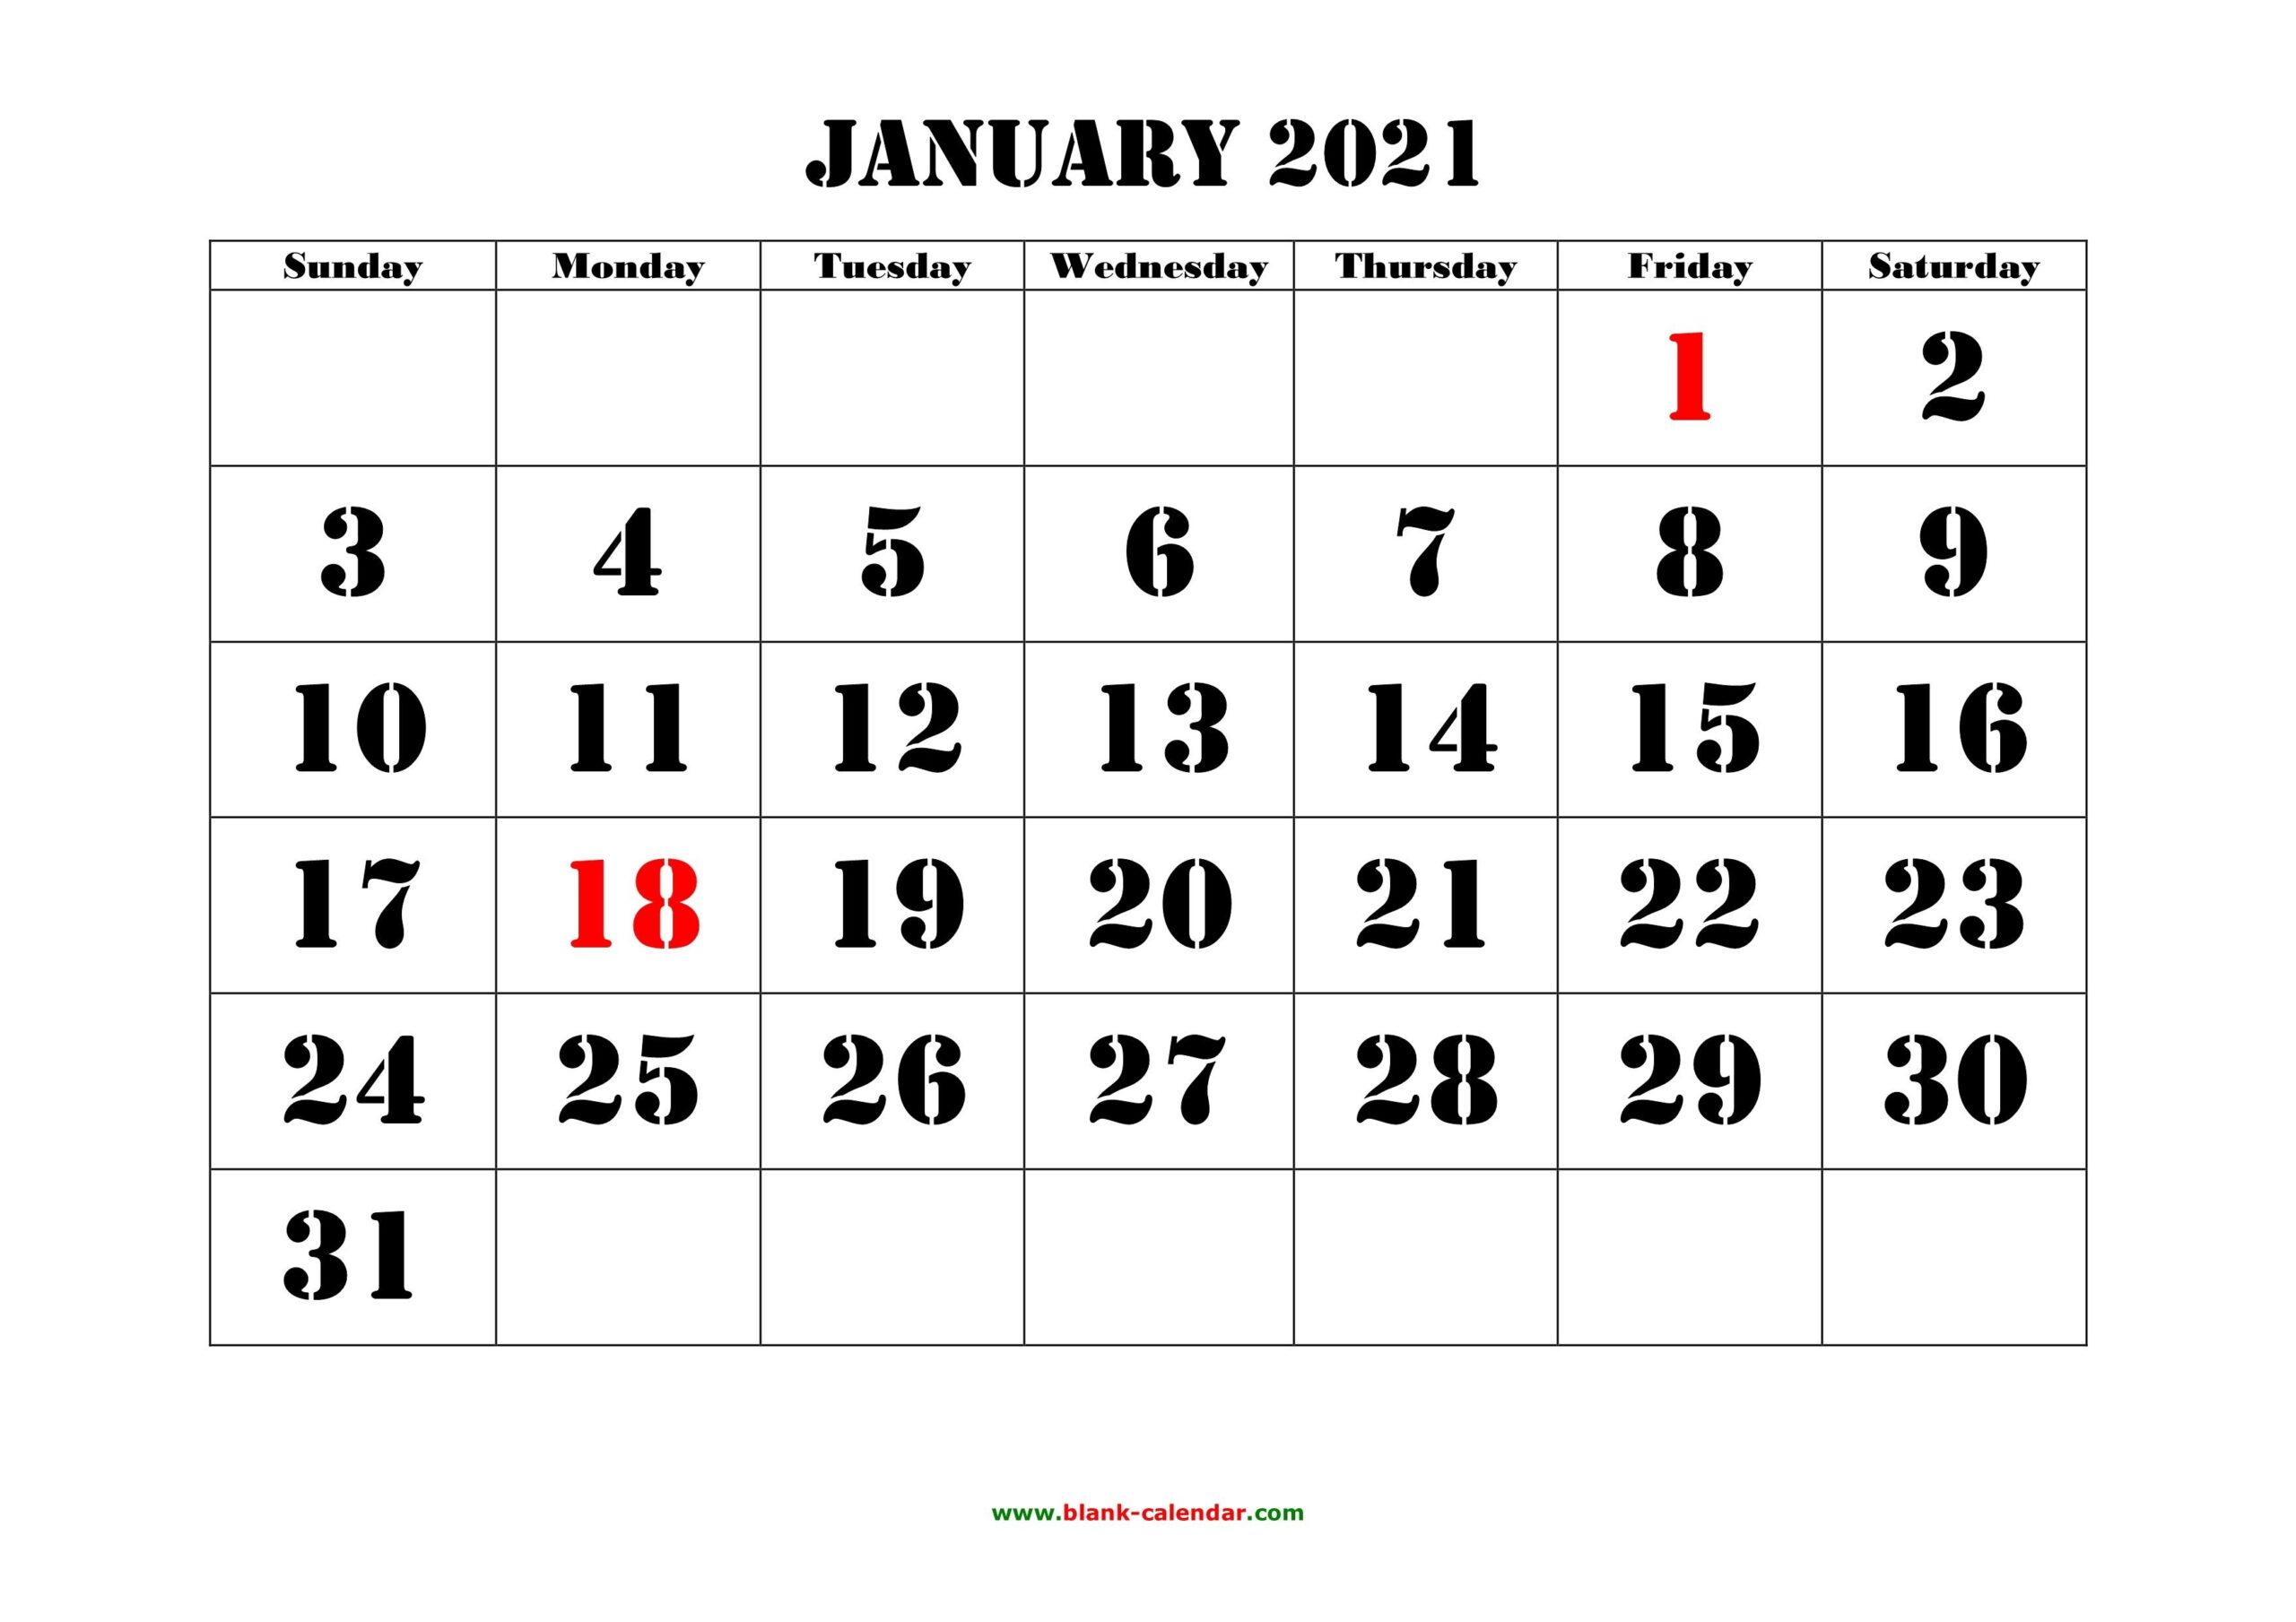 January 2021 Calendar - Free Download Printable Calendar